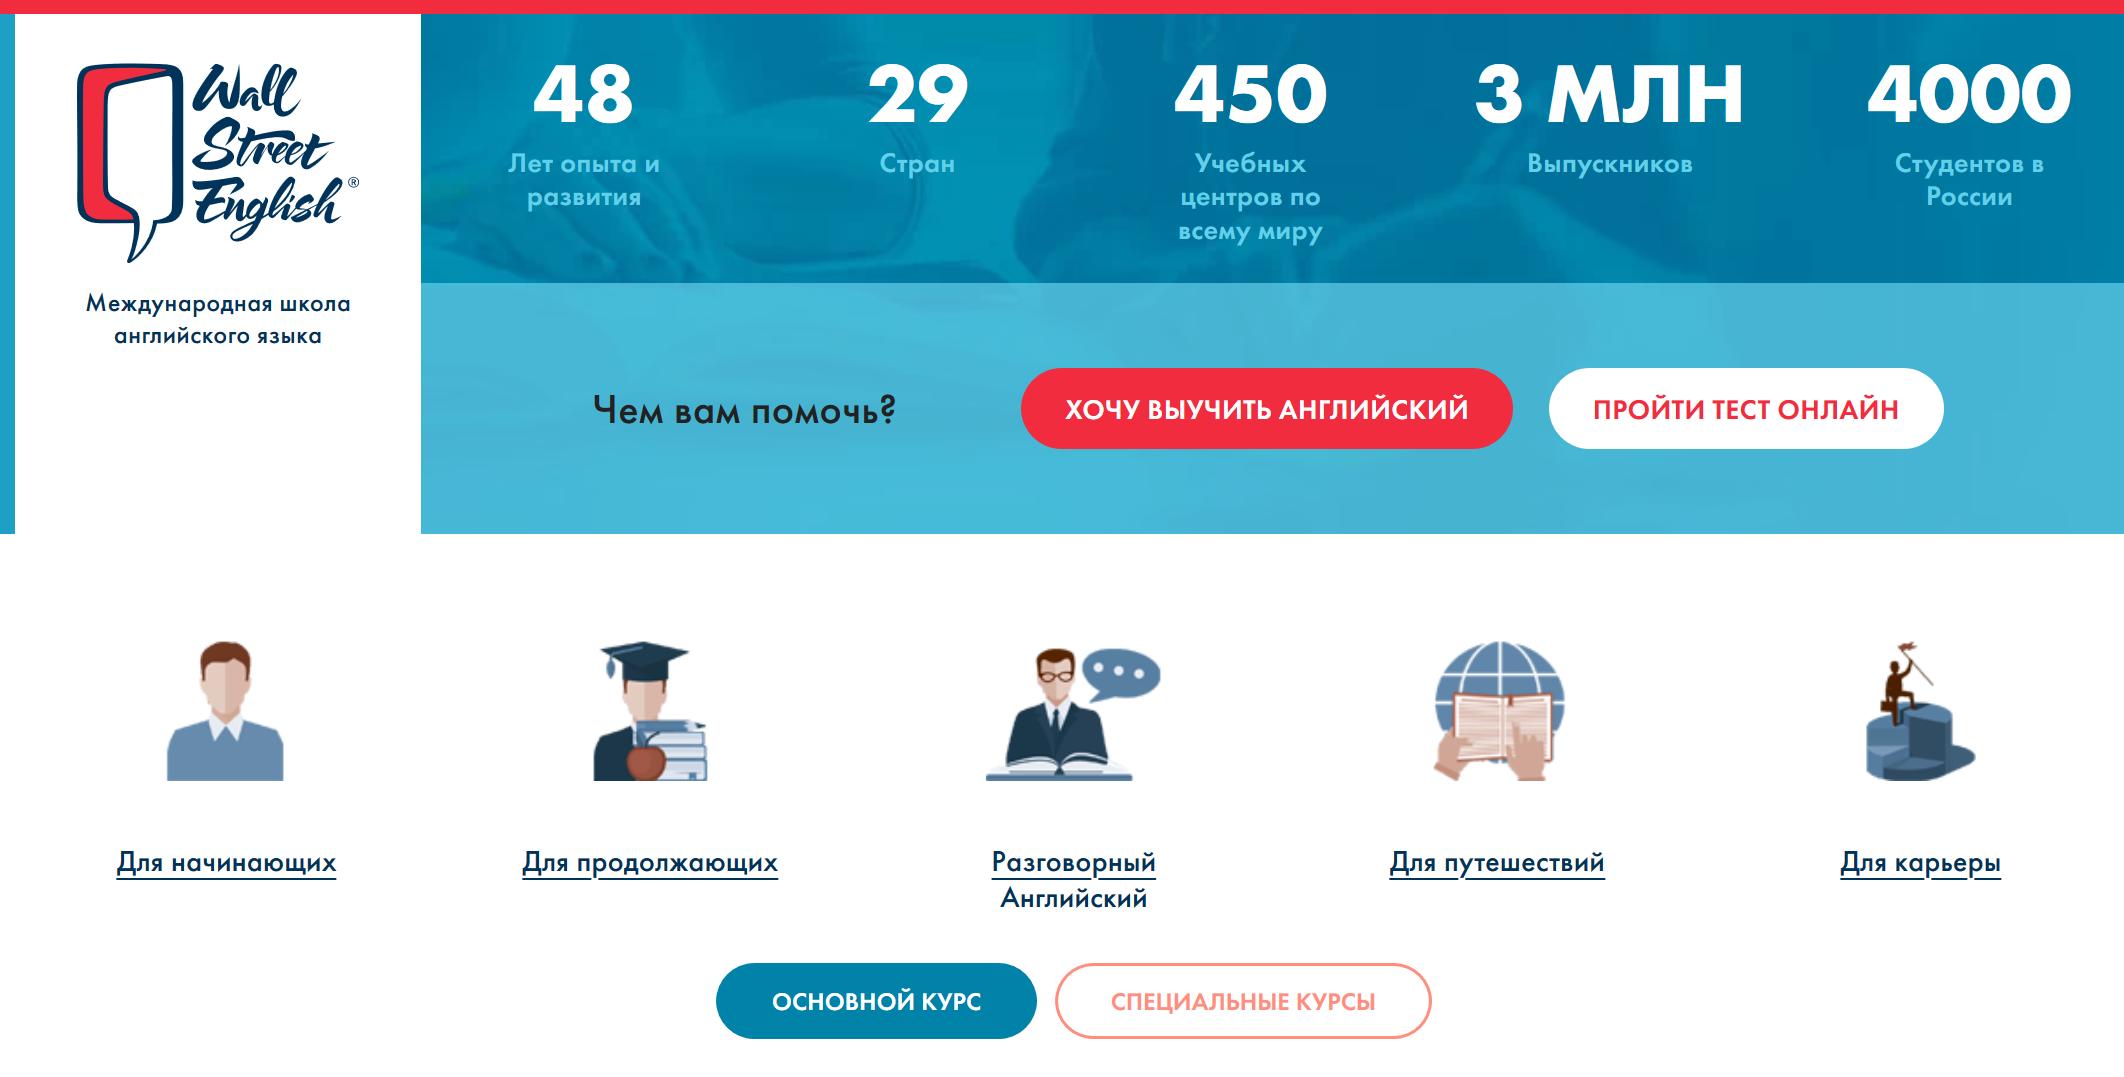 Школа английского языка в Москве Wall Street English